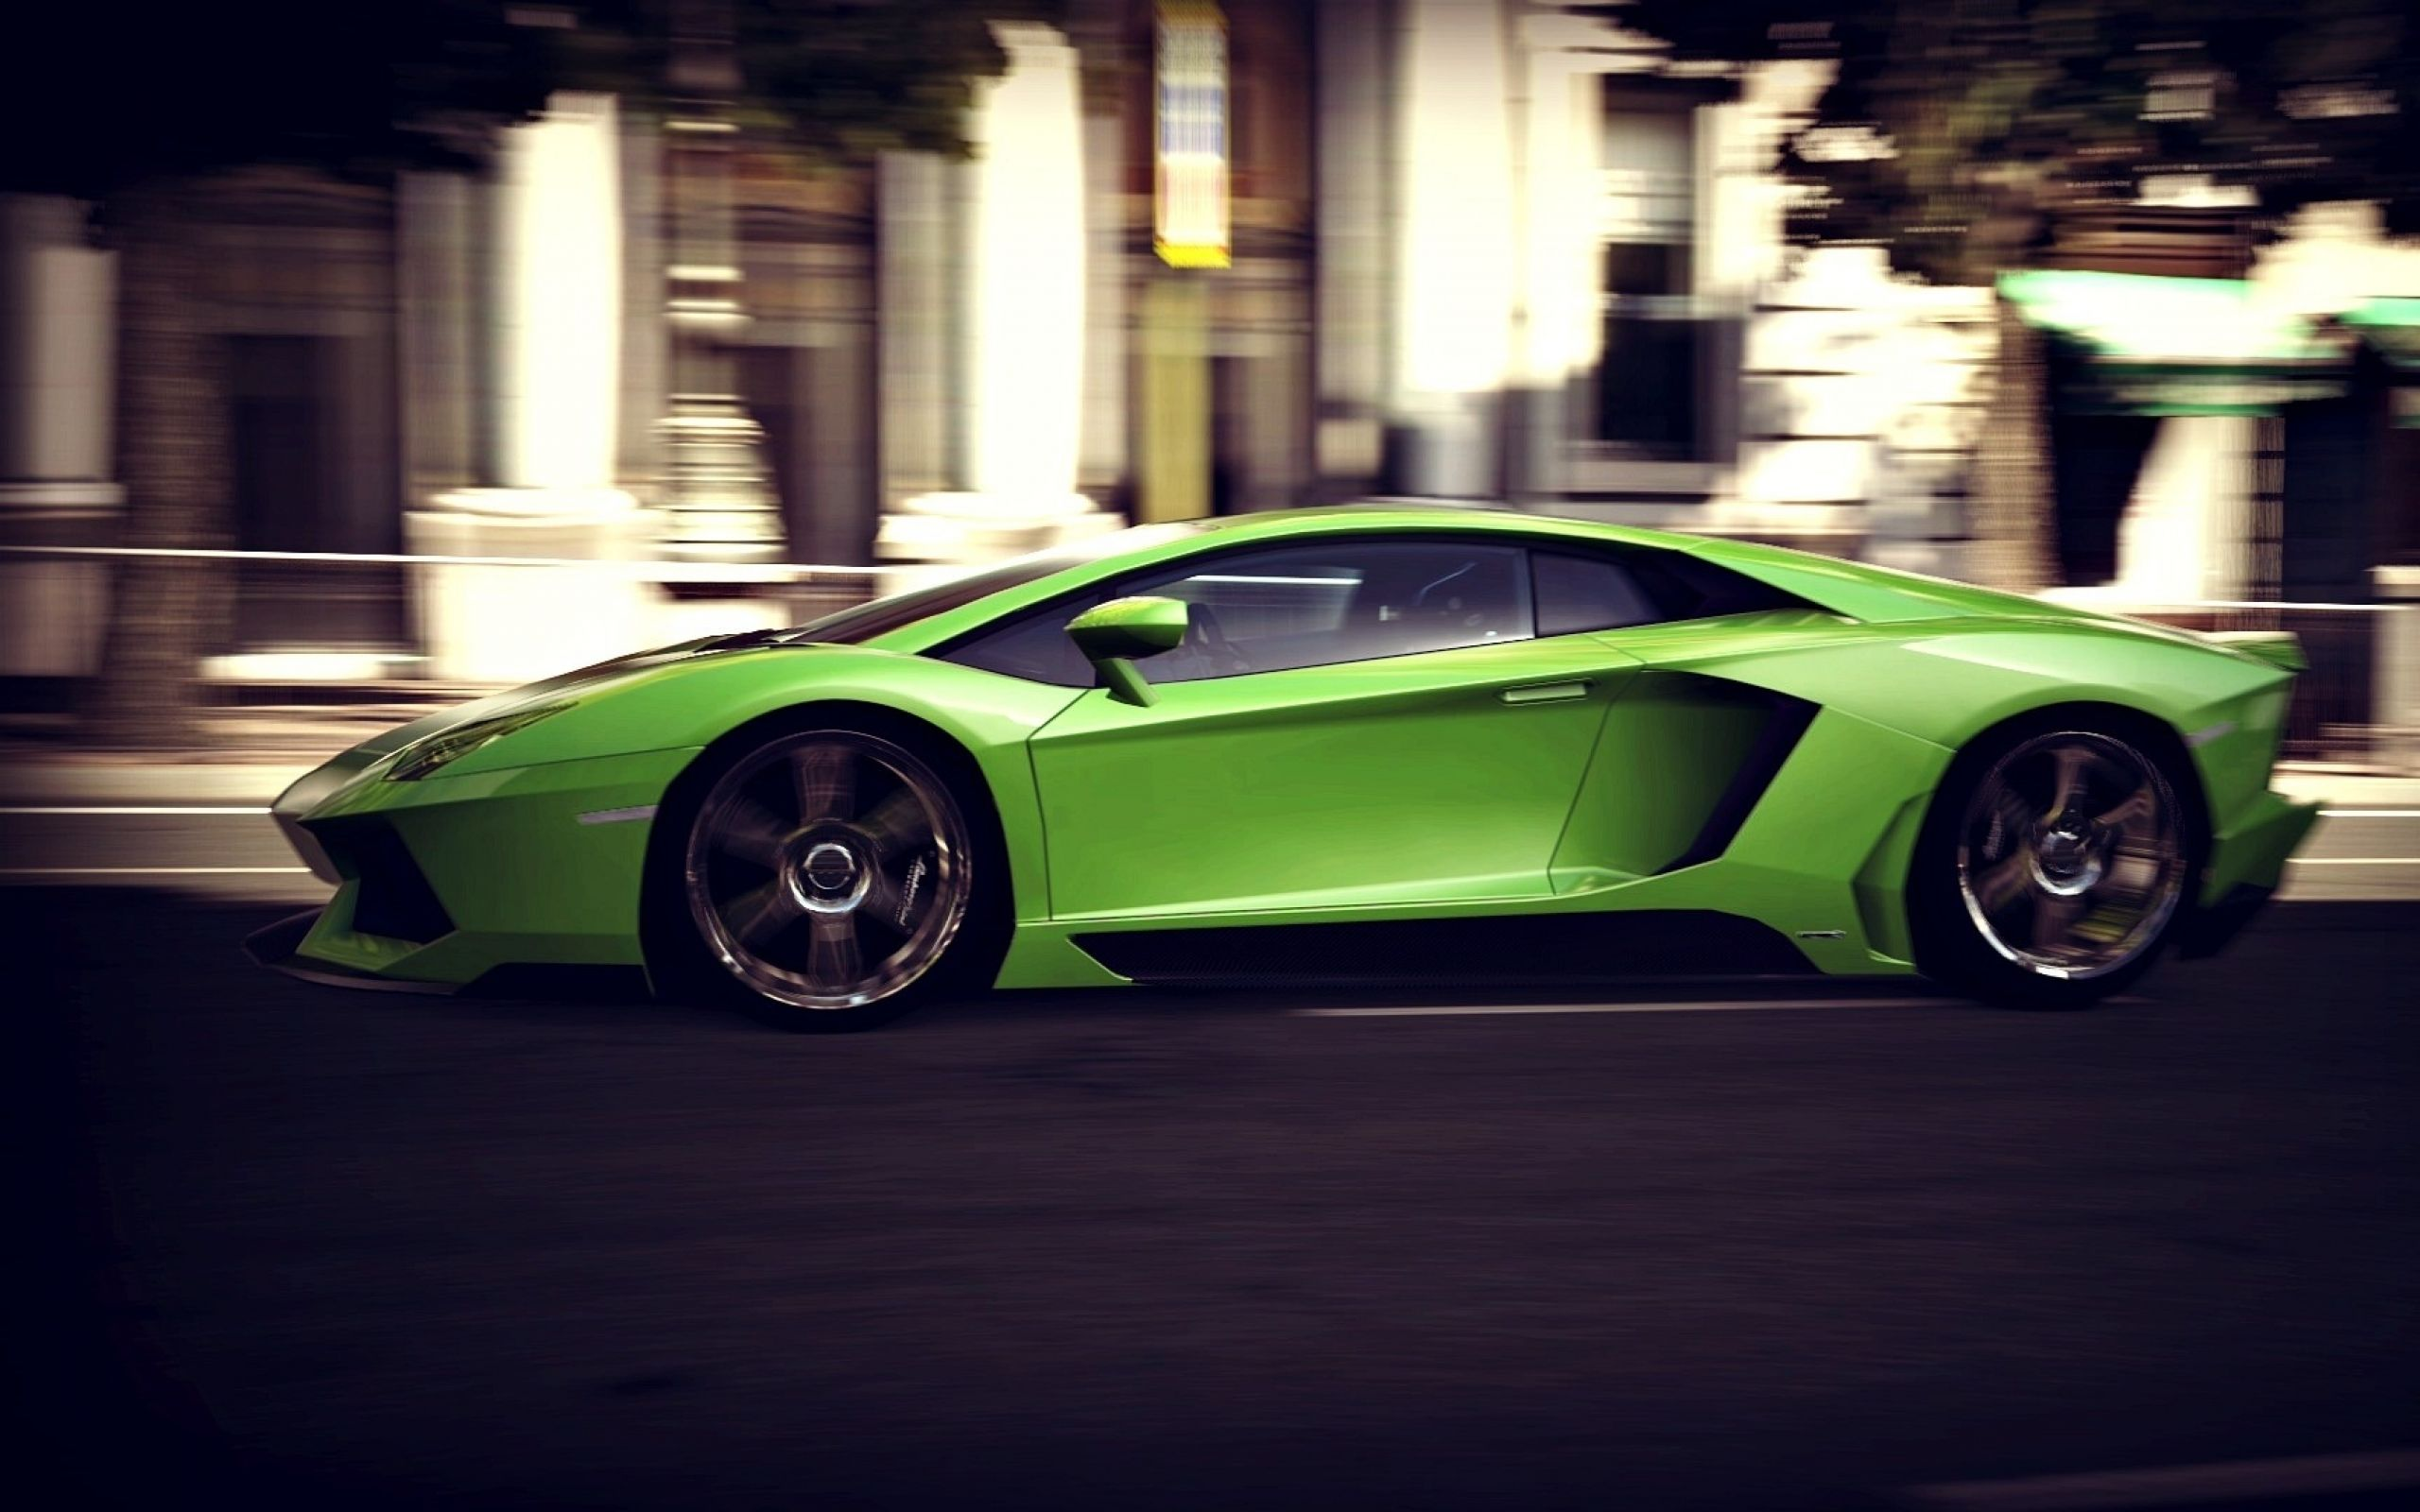 Lamborghini Aventador | Lamborghini aventador, 4k ...